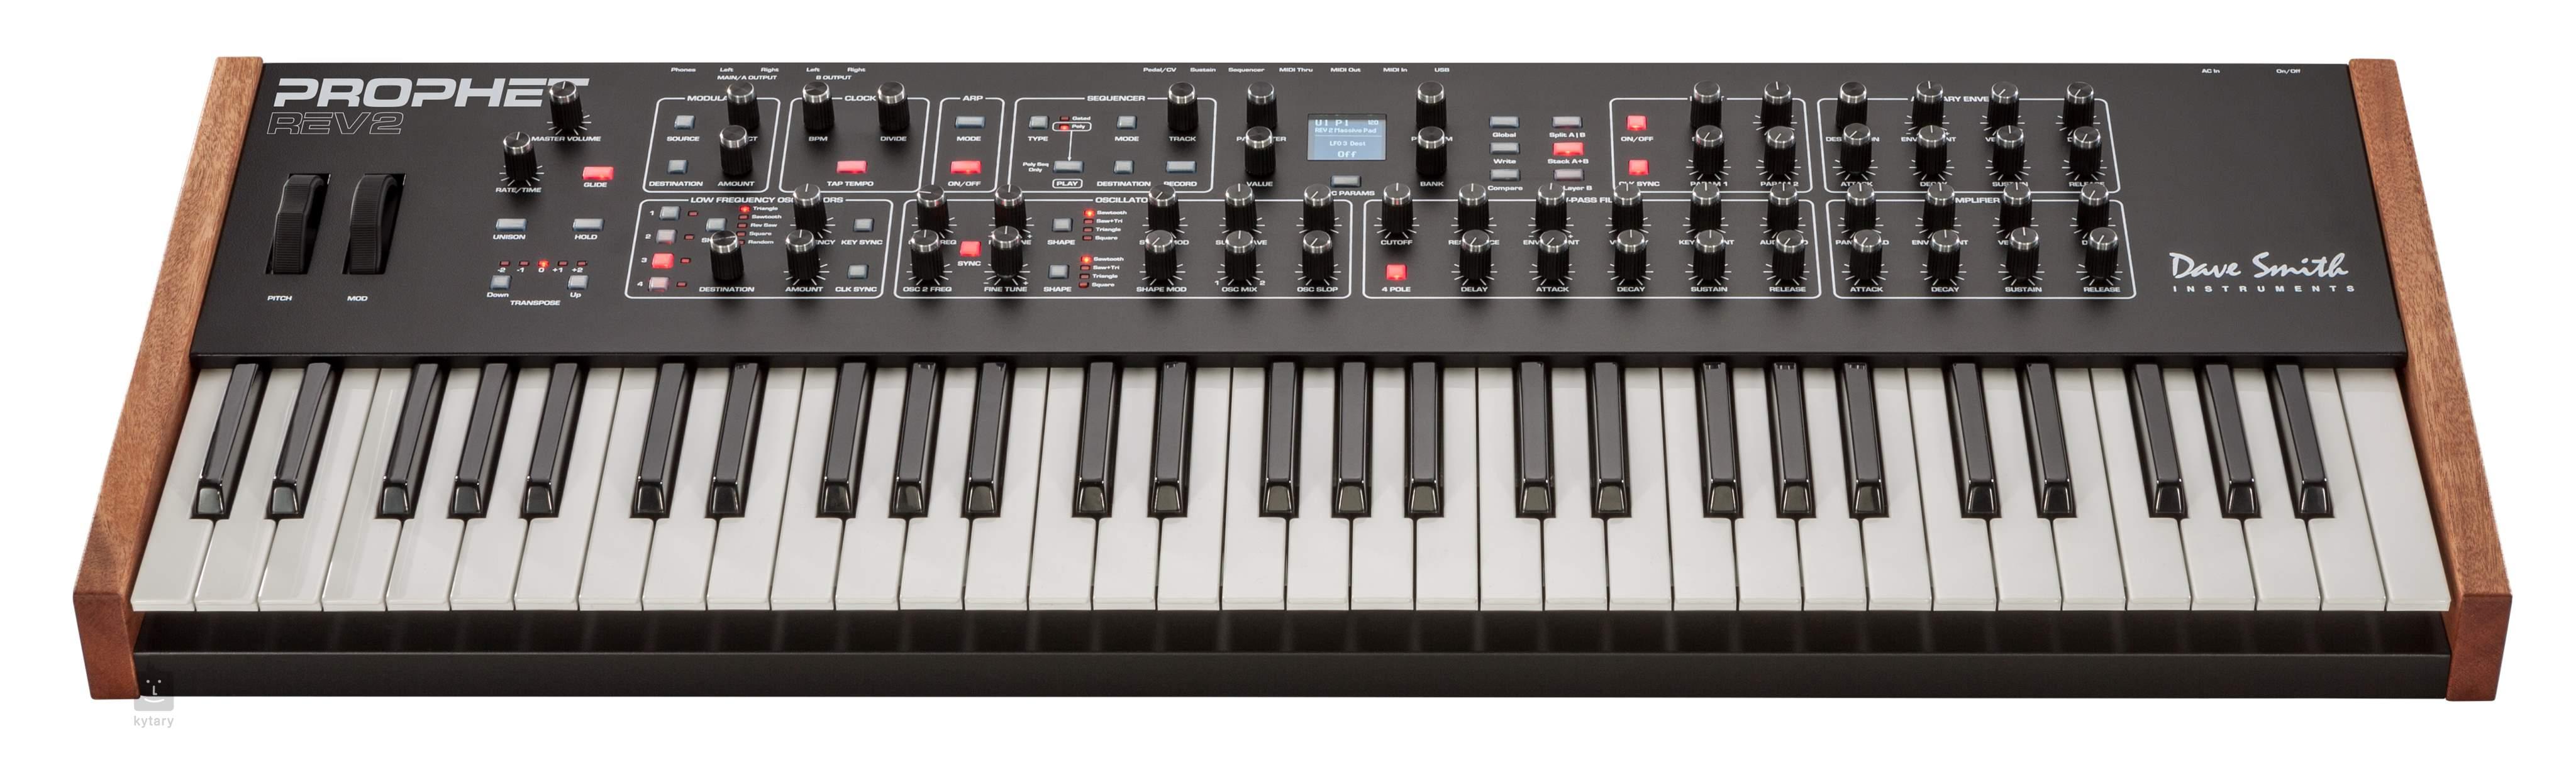 dave smith instruments prophet rev2 8 synthesizer. Black Bedroom Furniture Sets. Home Design Ideas